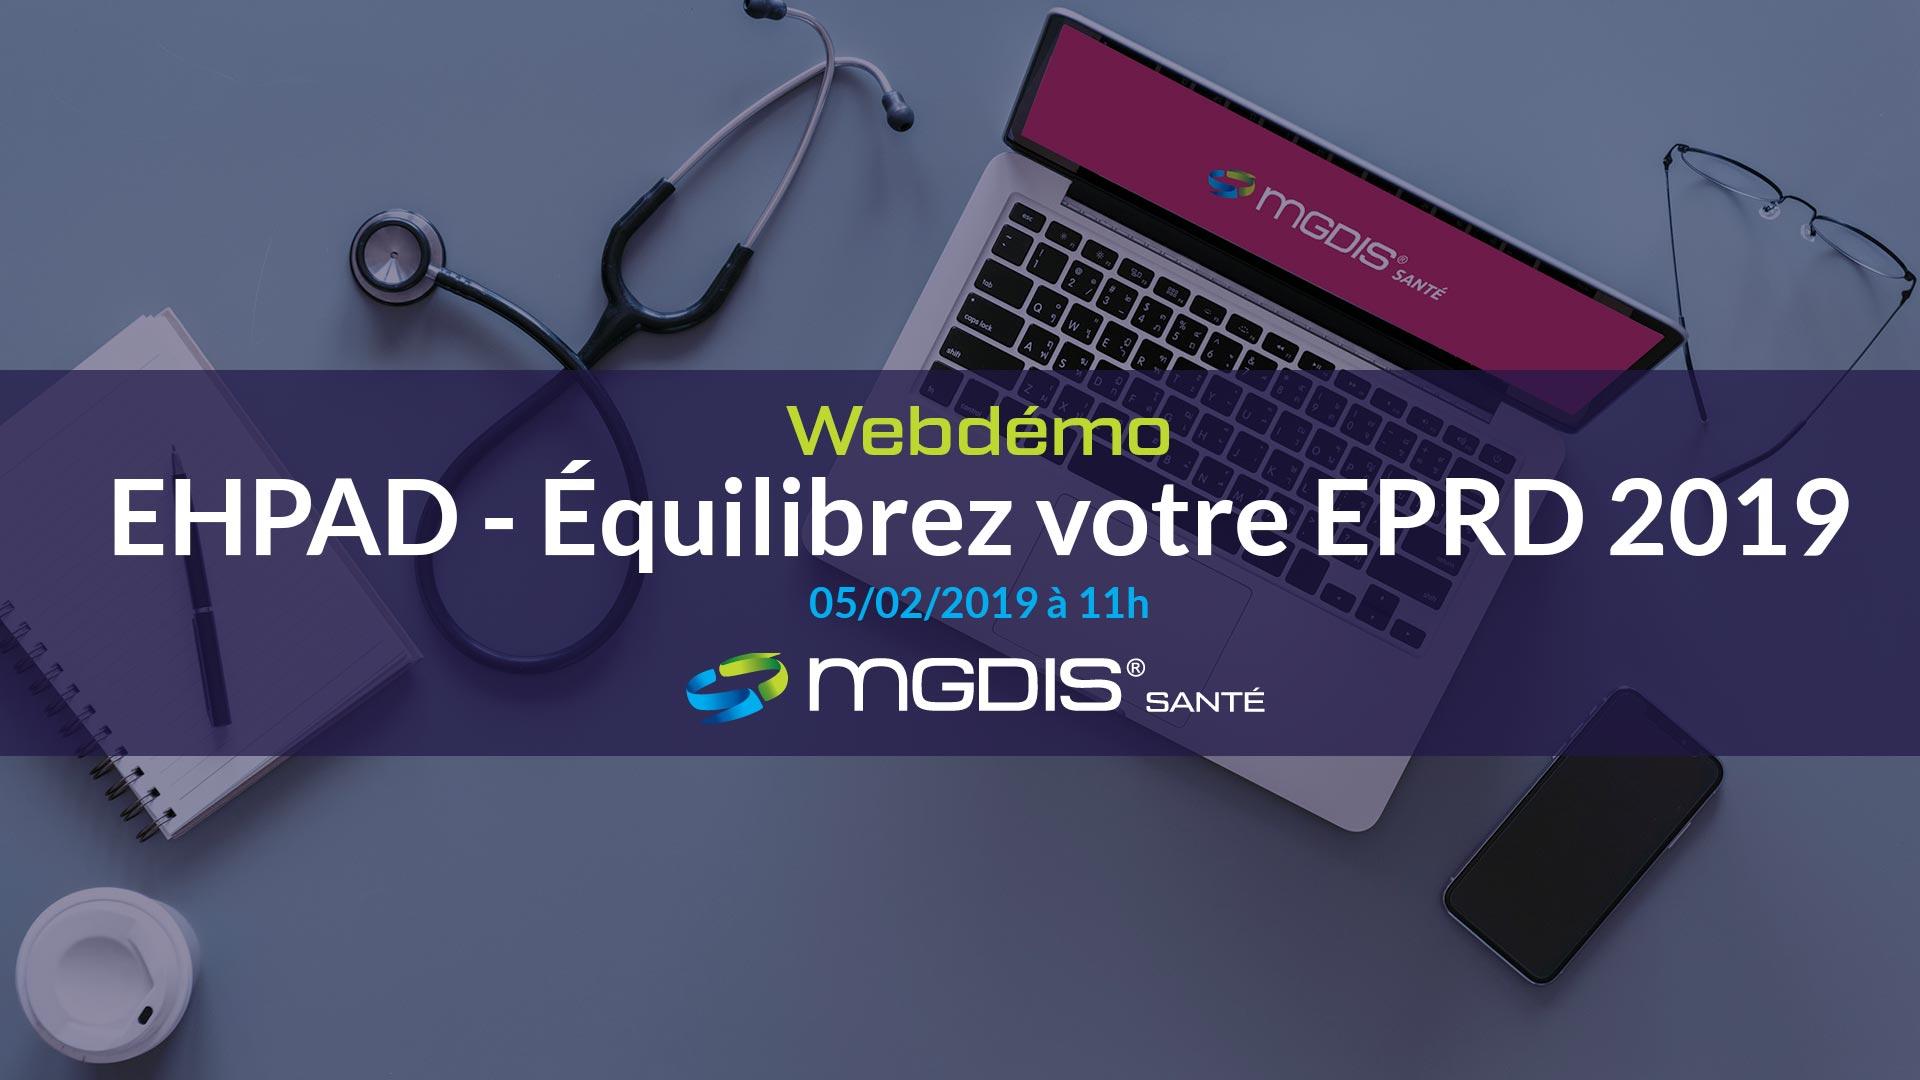 webdemo-EPRD-2019-MGDIS-sante-04